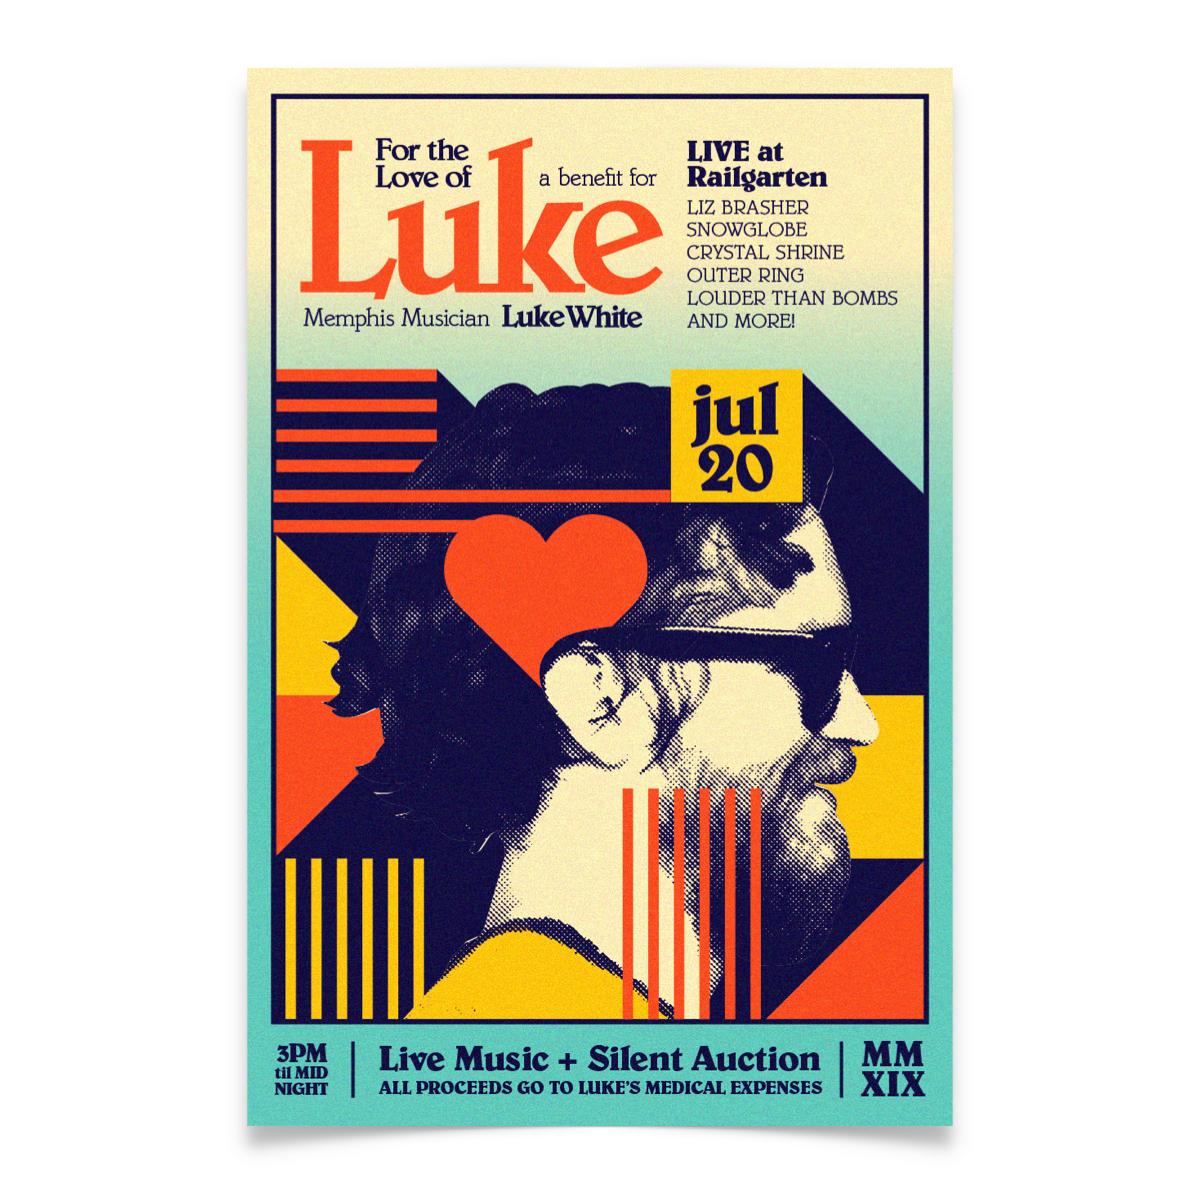 LukeWhite-Benefit-12x18-Poster.png